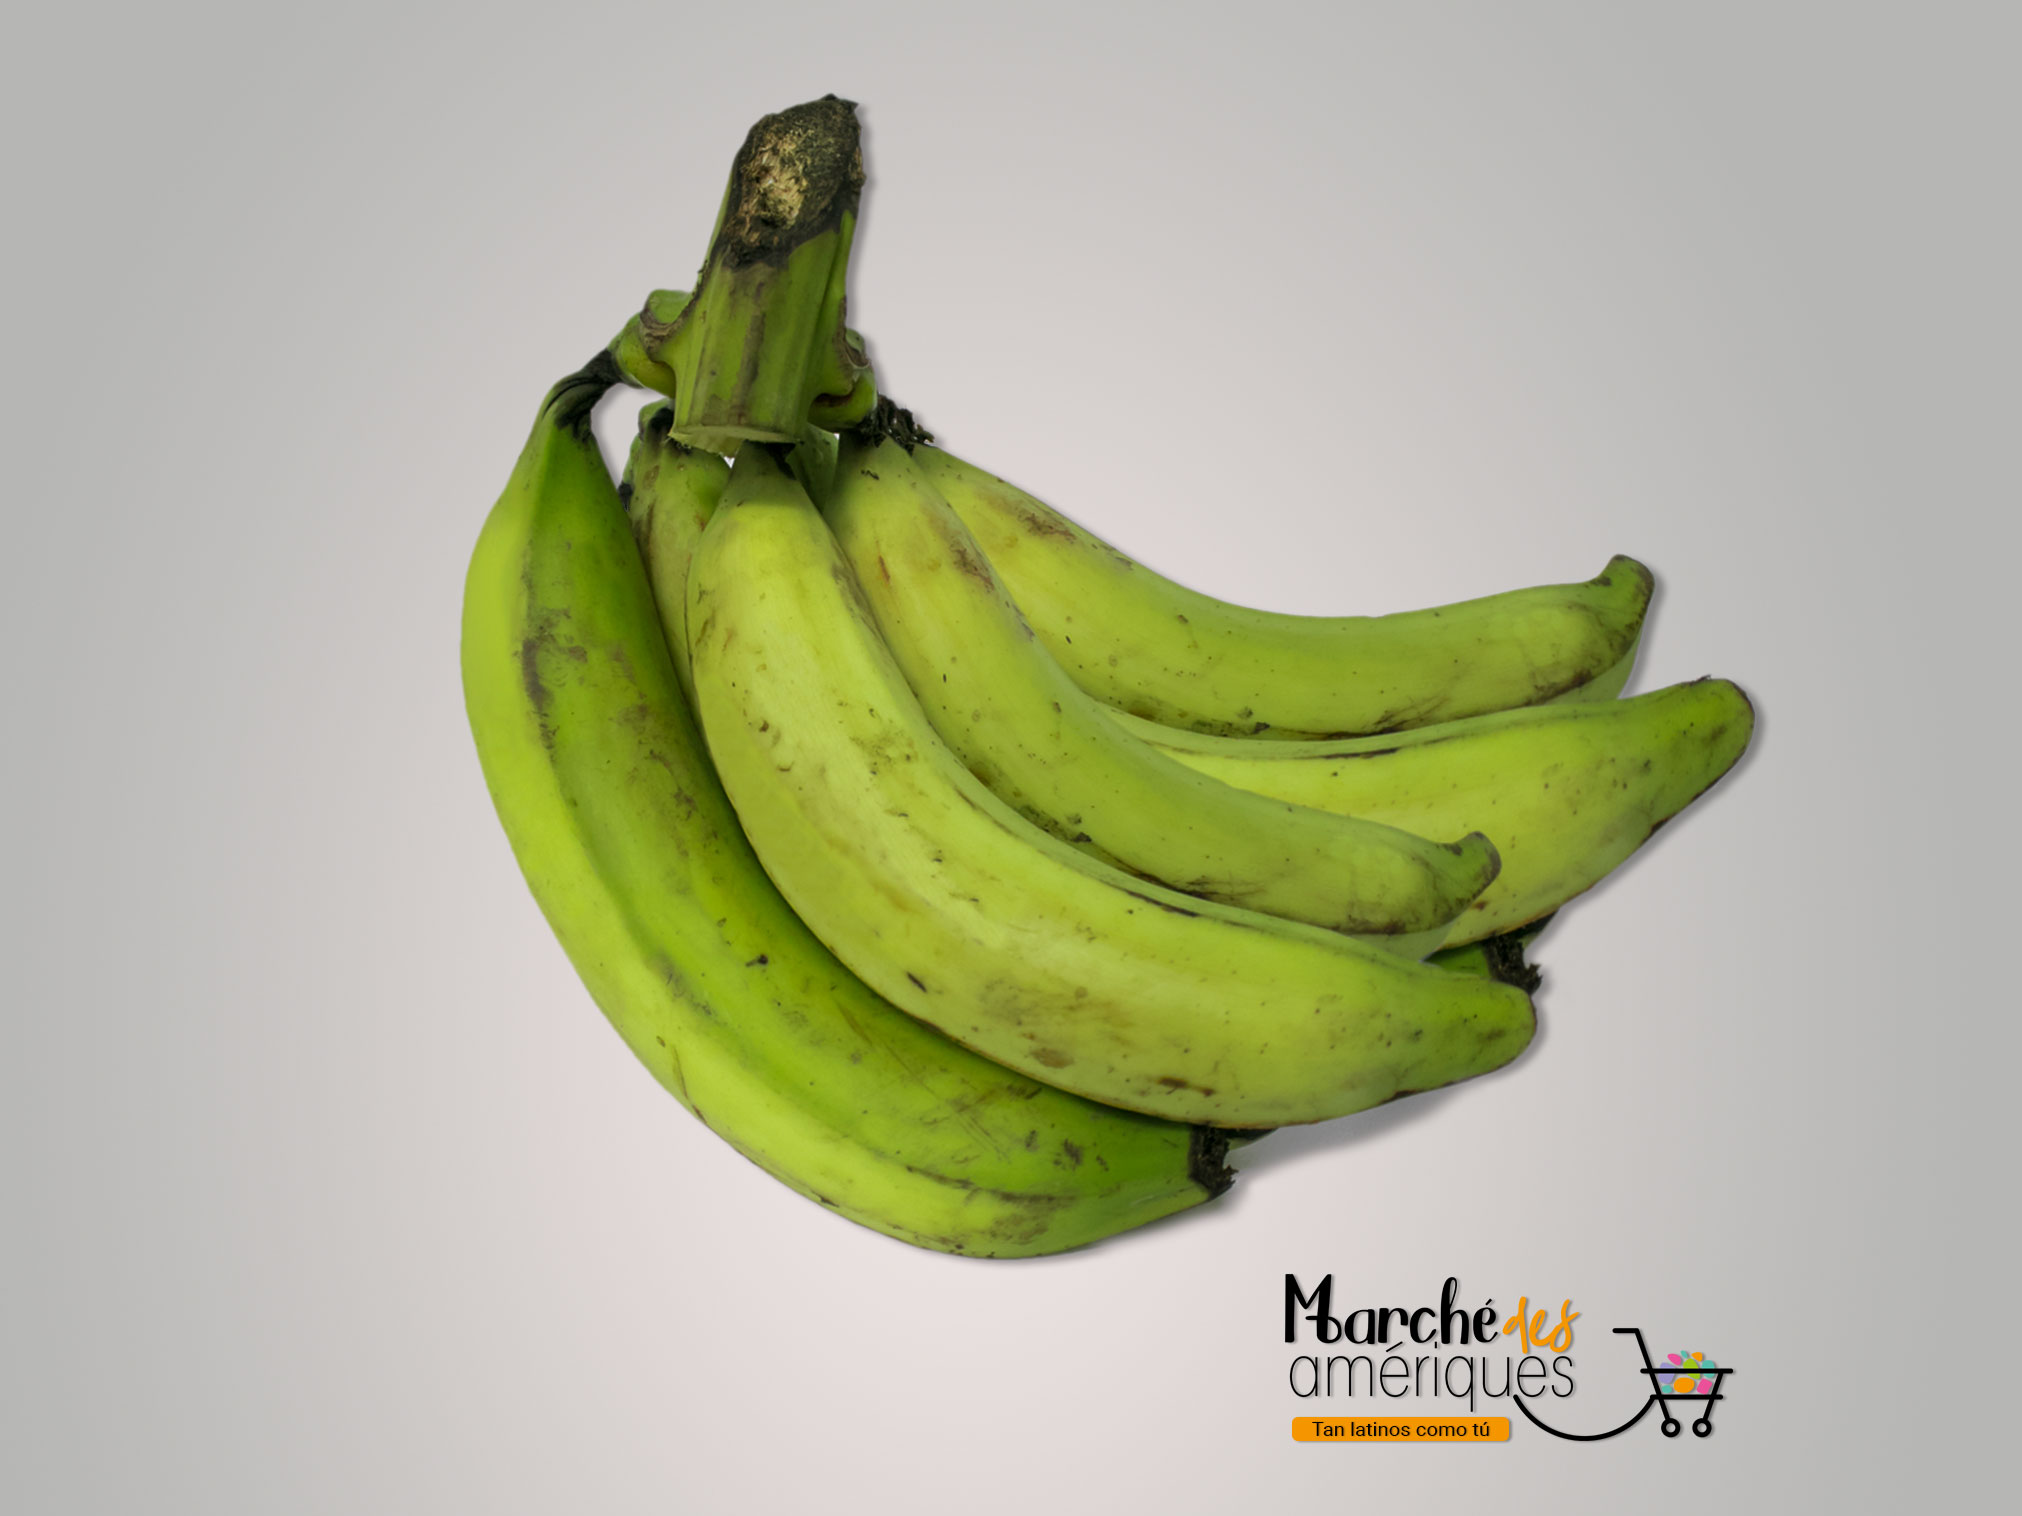 Plátano - Marché des Amériques - Código de Barras